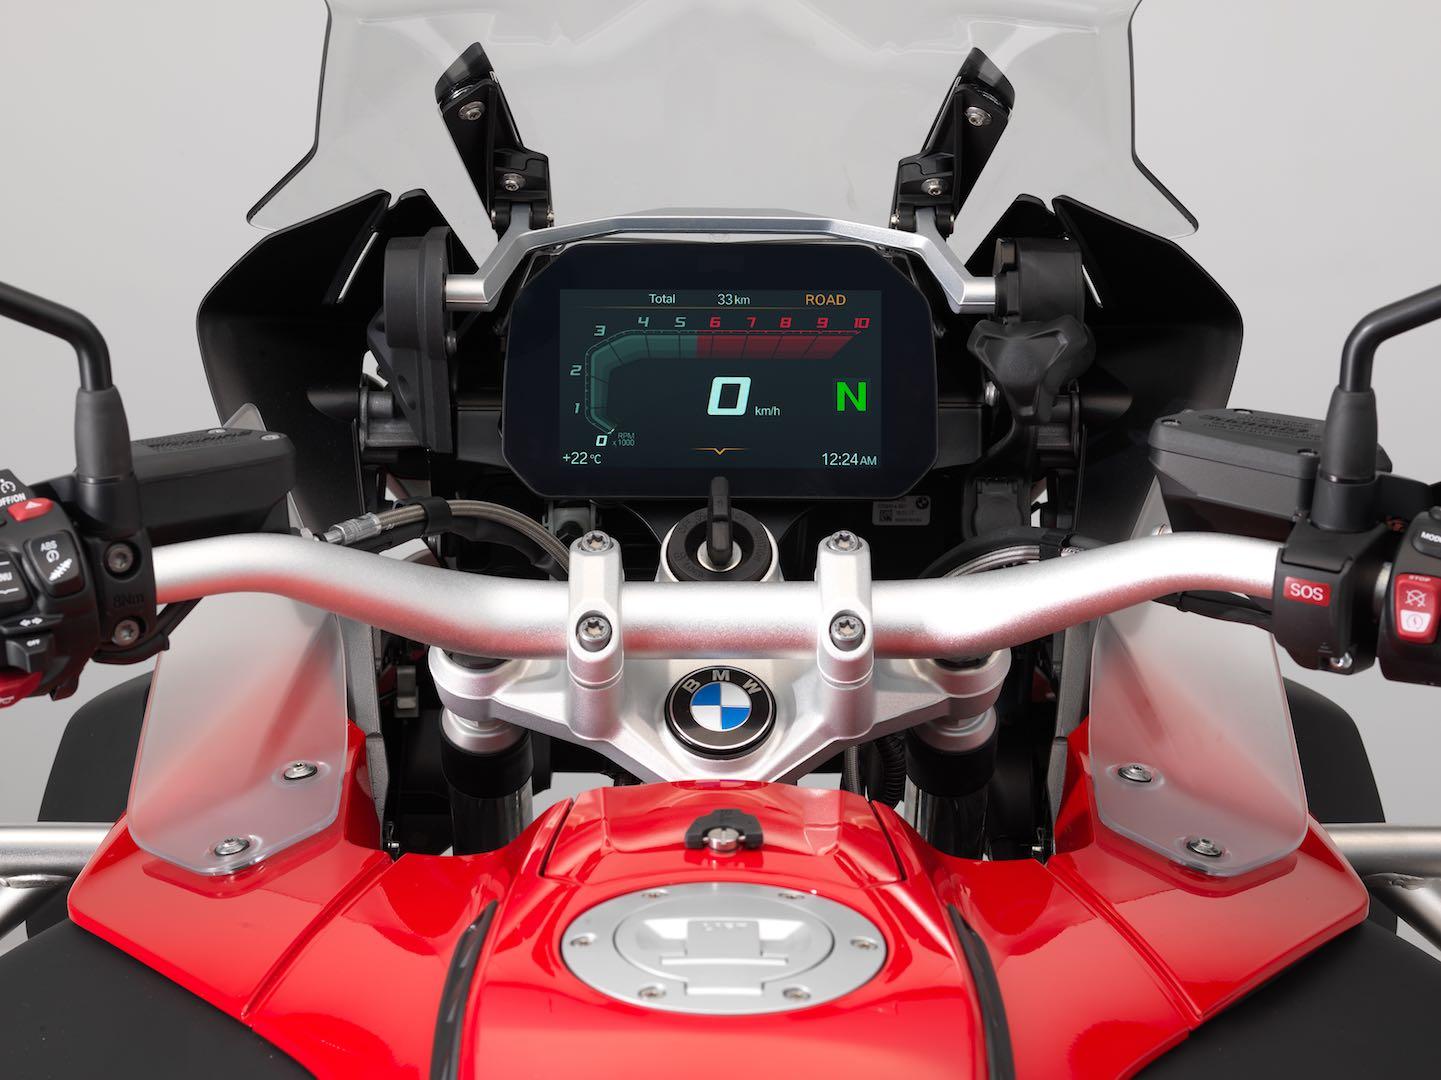 2018 BMW R 1200 GS Adventure Connectivity Display